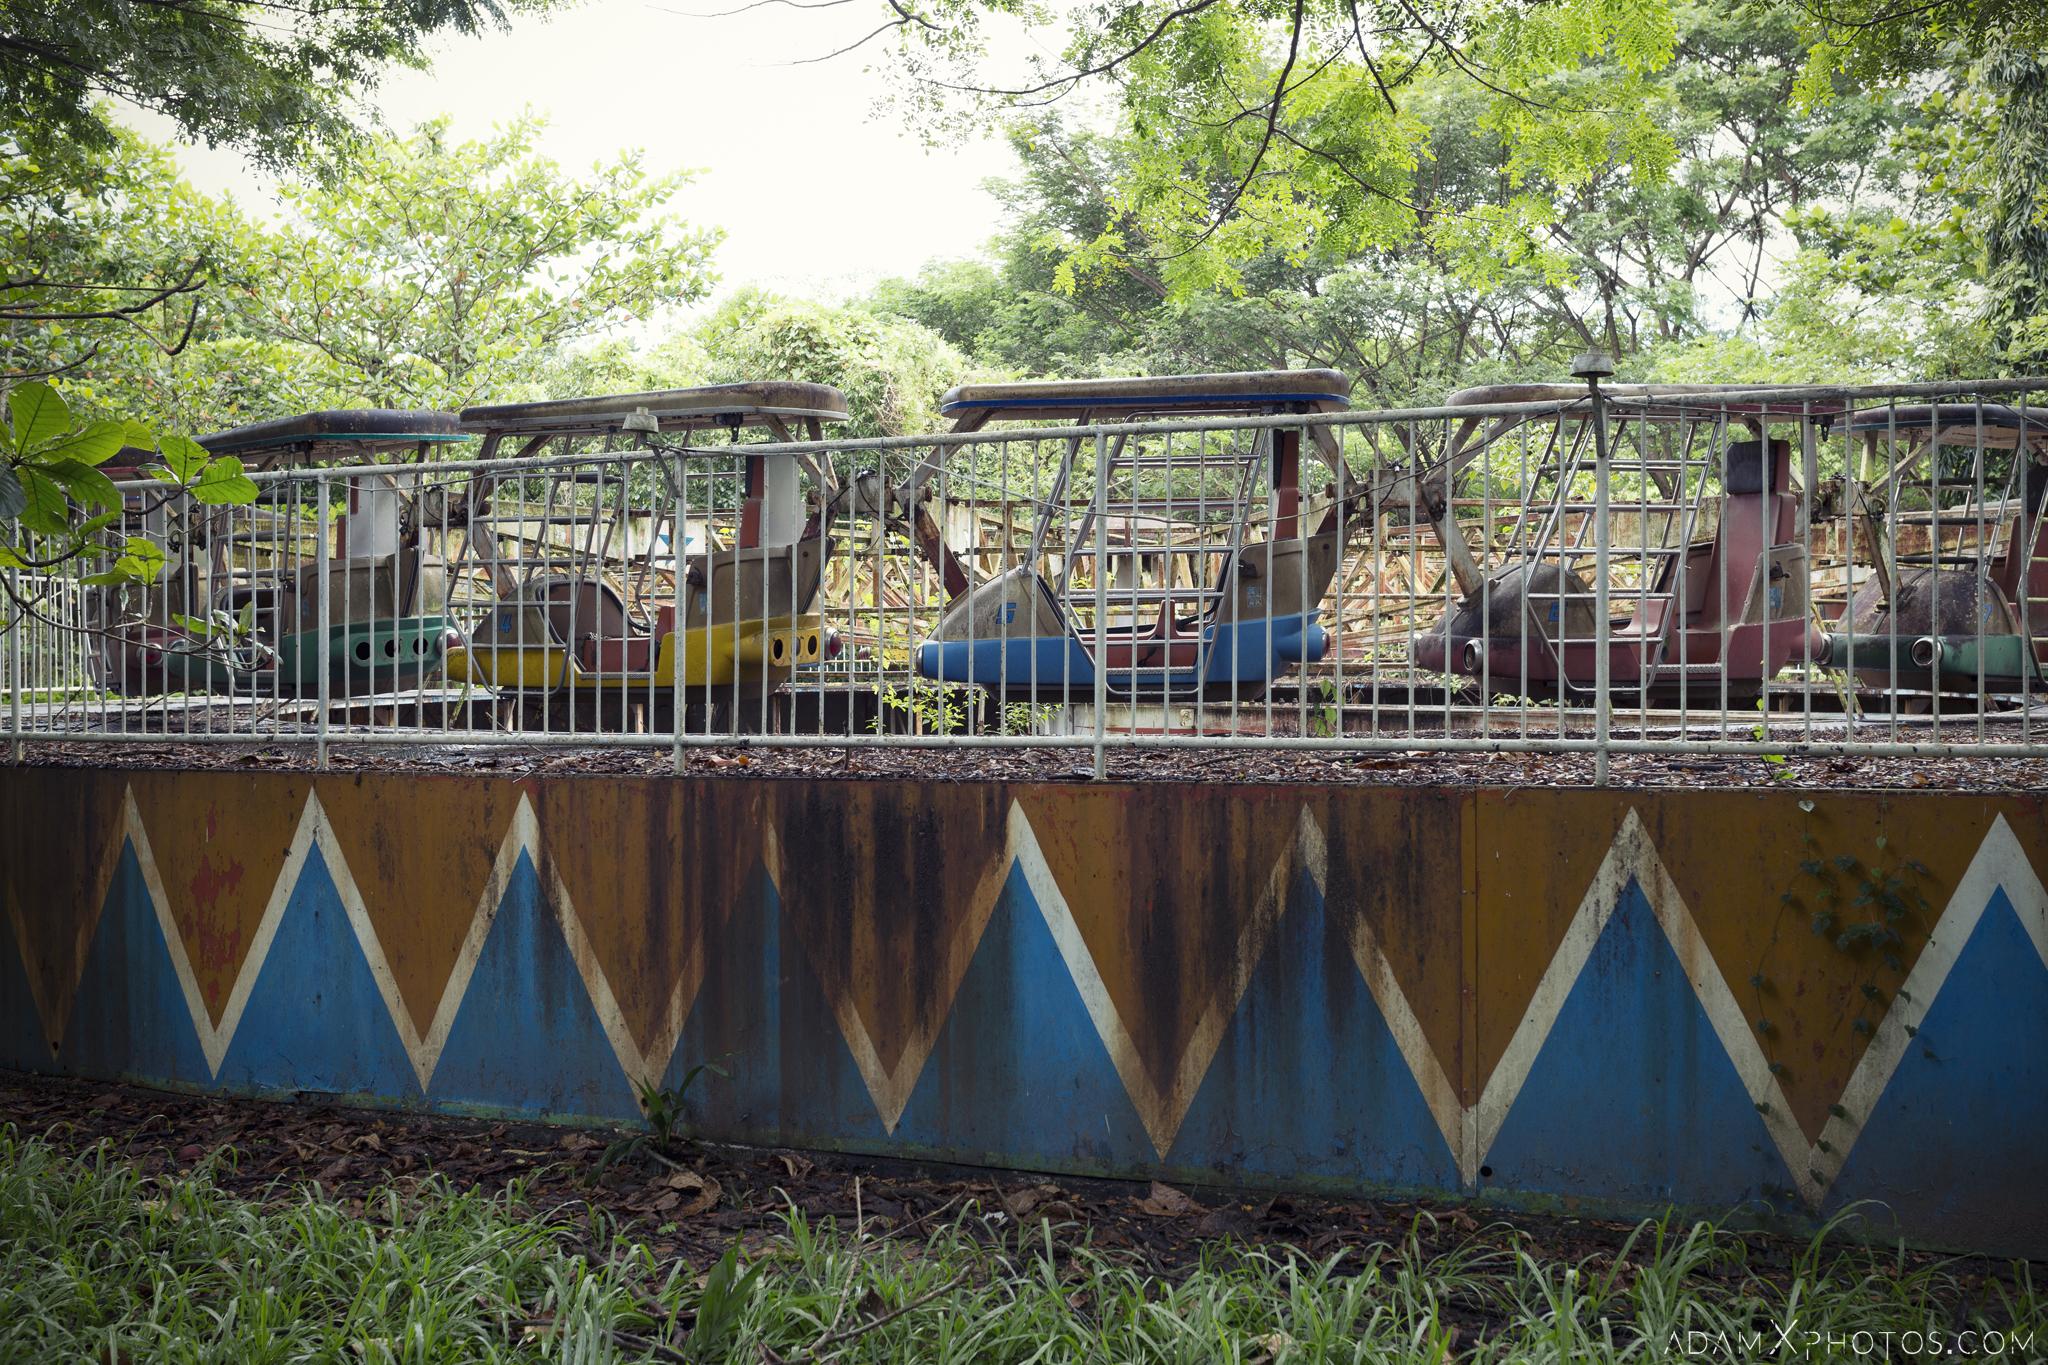 Carousel ride Happy World Theme Park Amusement Park Fairground Myanmar Burma Yangon Rangoon Urbex Adam X Urban Exploration Access 2016 Abandoned decay lost forgotten derelict location creepy haunting eerie